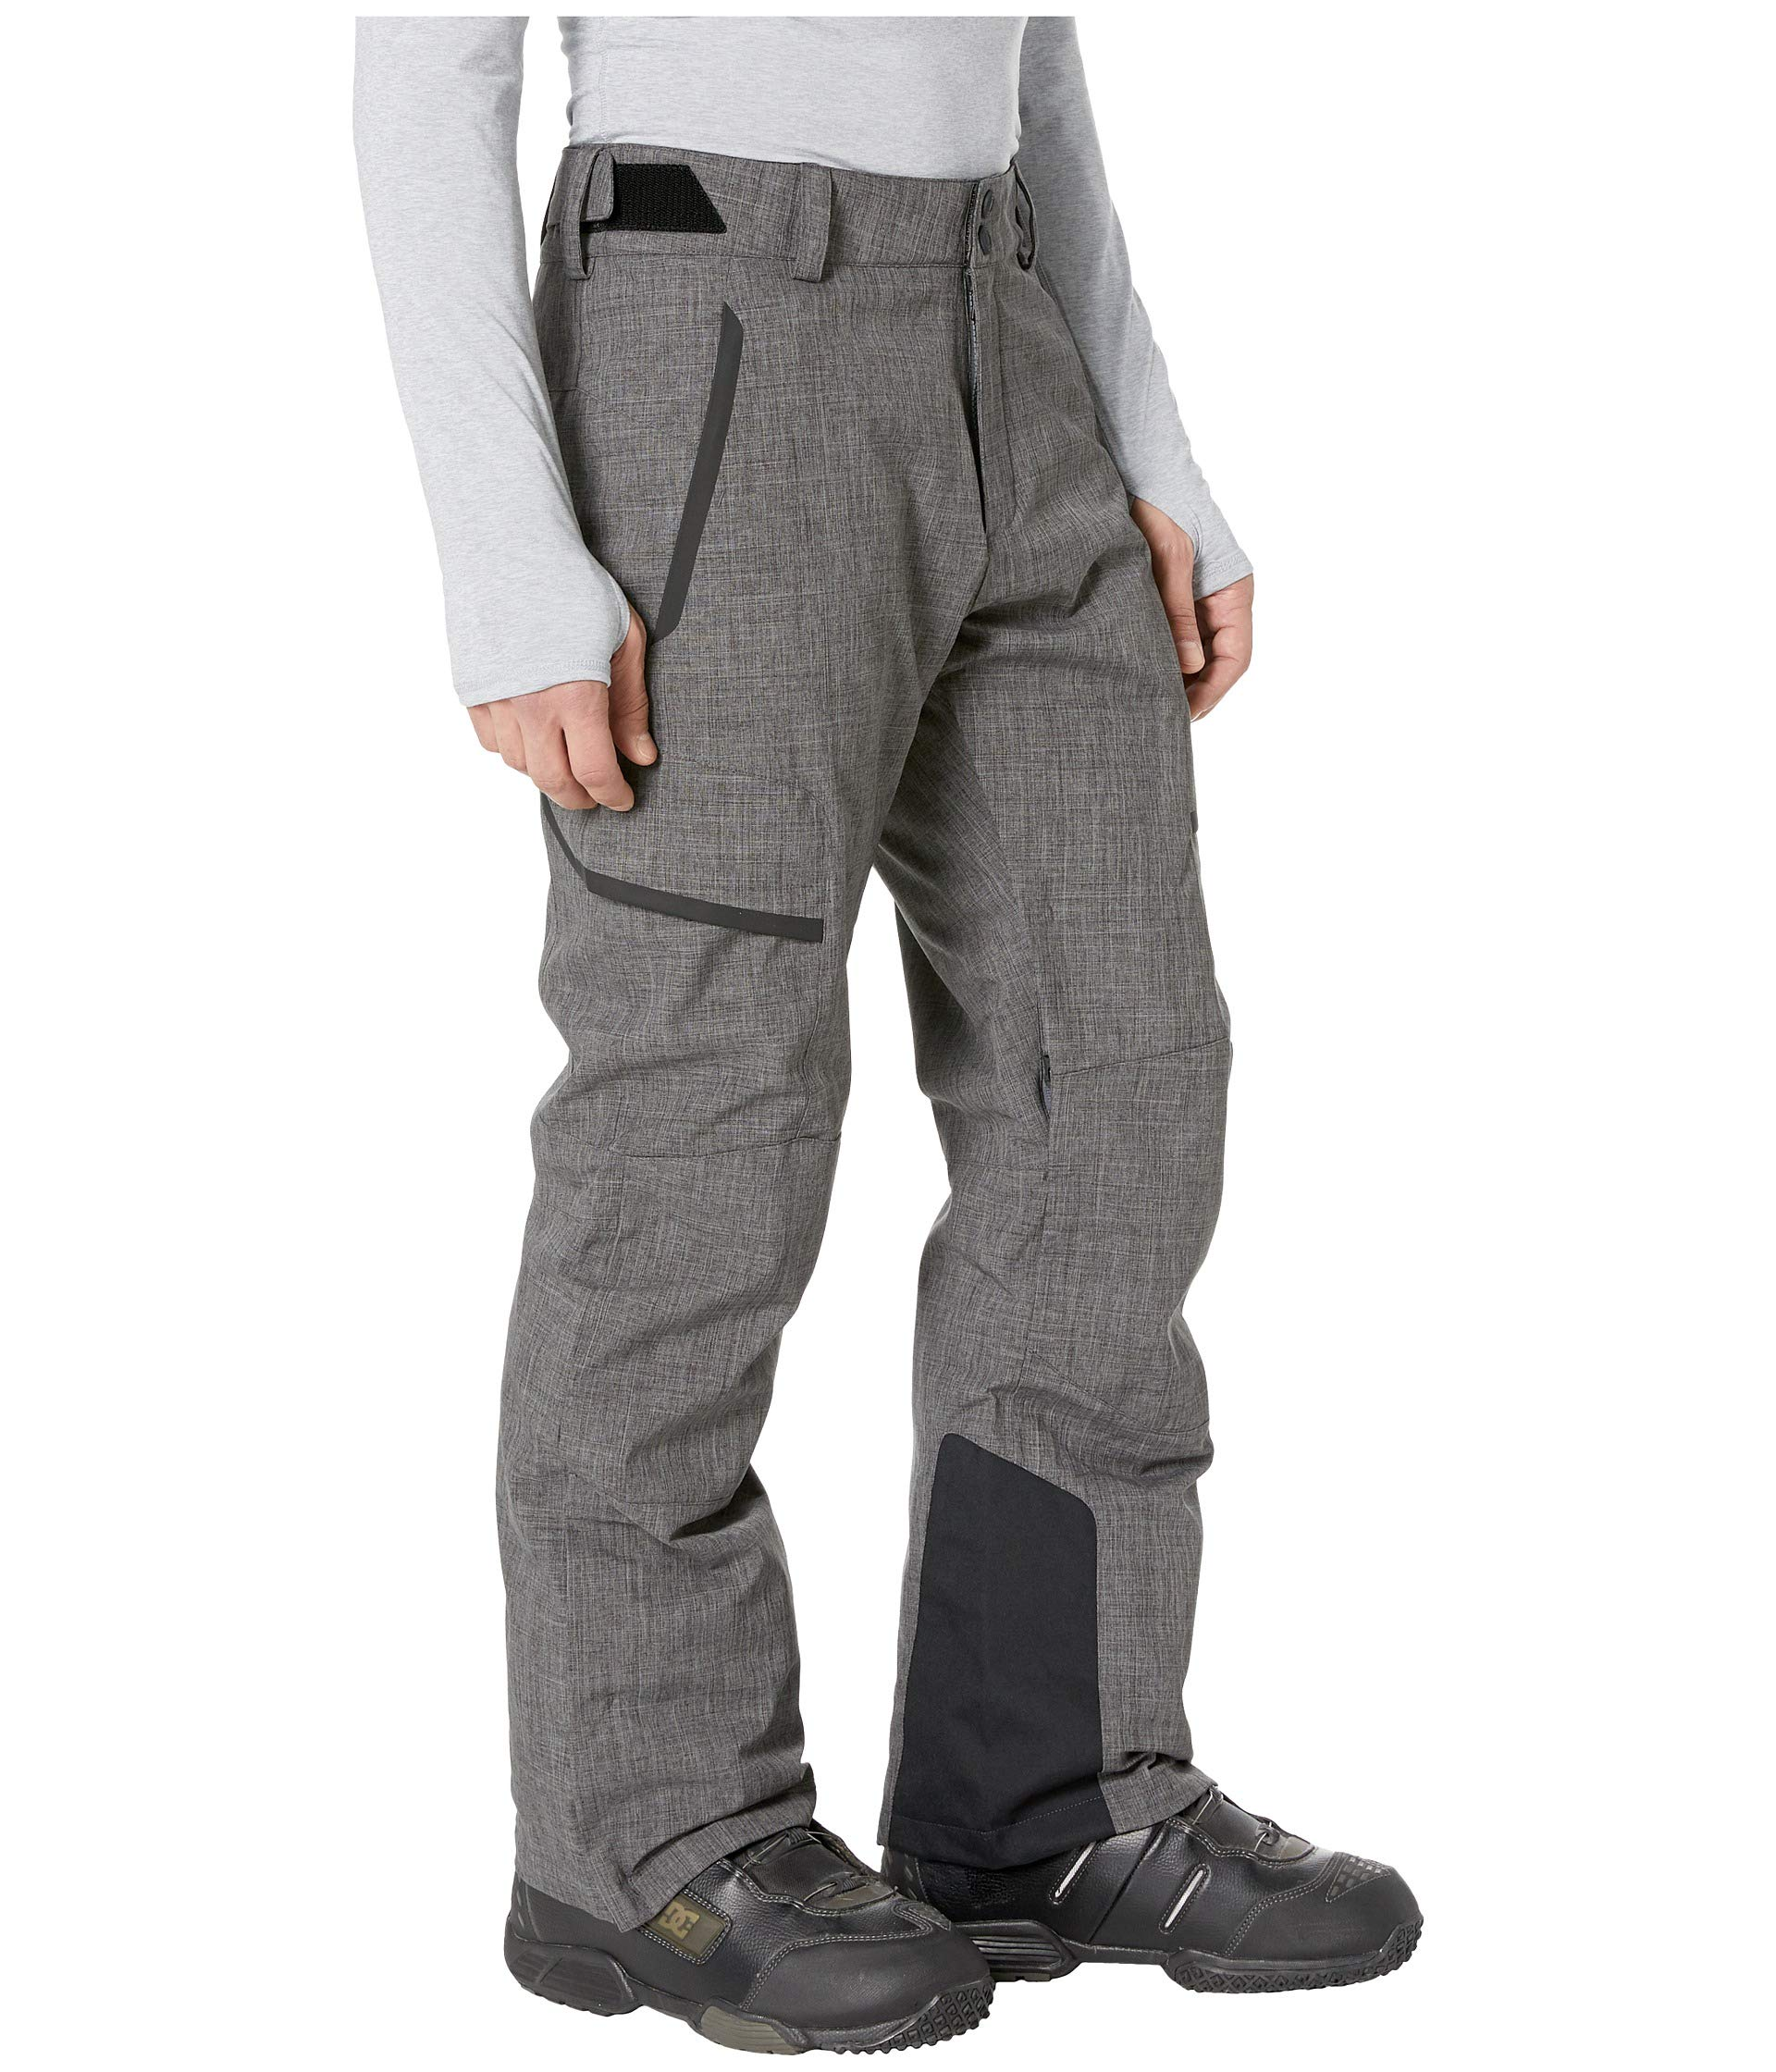 Orion Obermeyer Pants Orion Pants Carbon Obermeyer Black tH6Fw0q